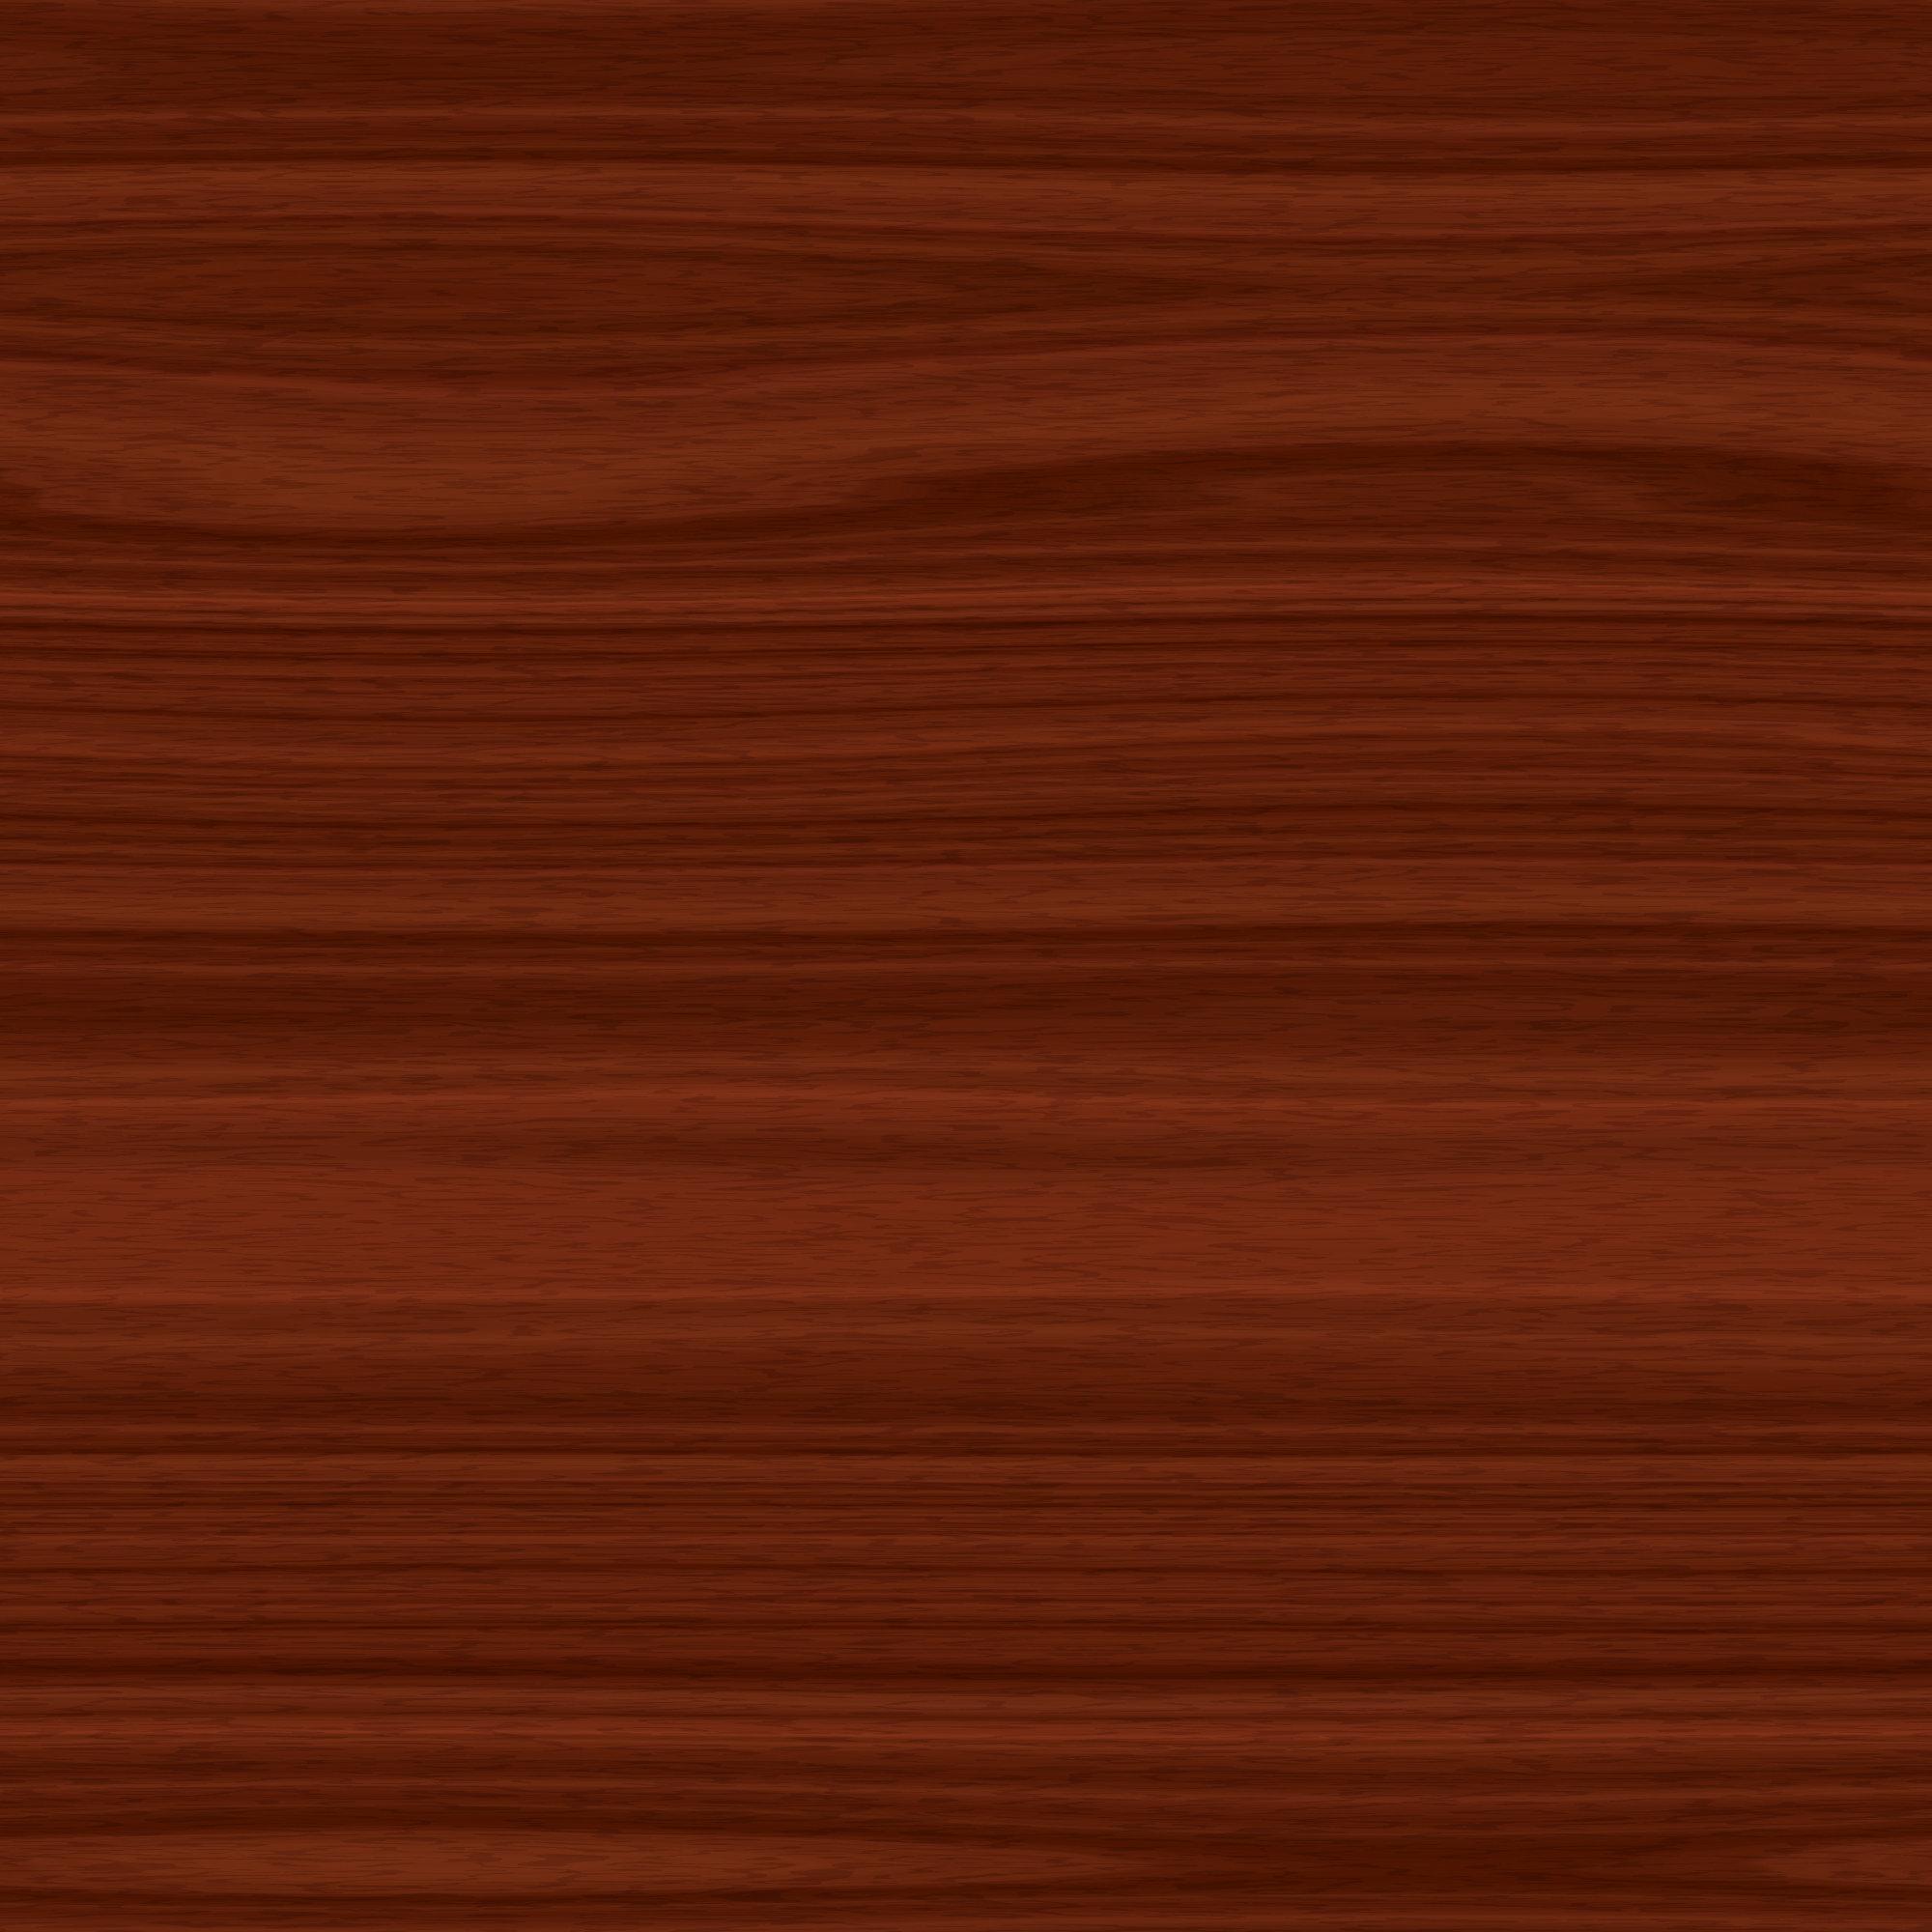 Raw Mahogany Wood ~ Red seamless wood texture myfreetextures